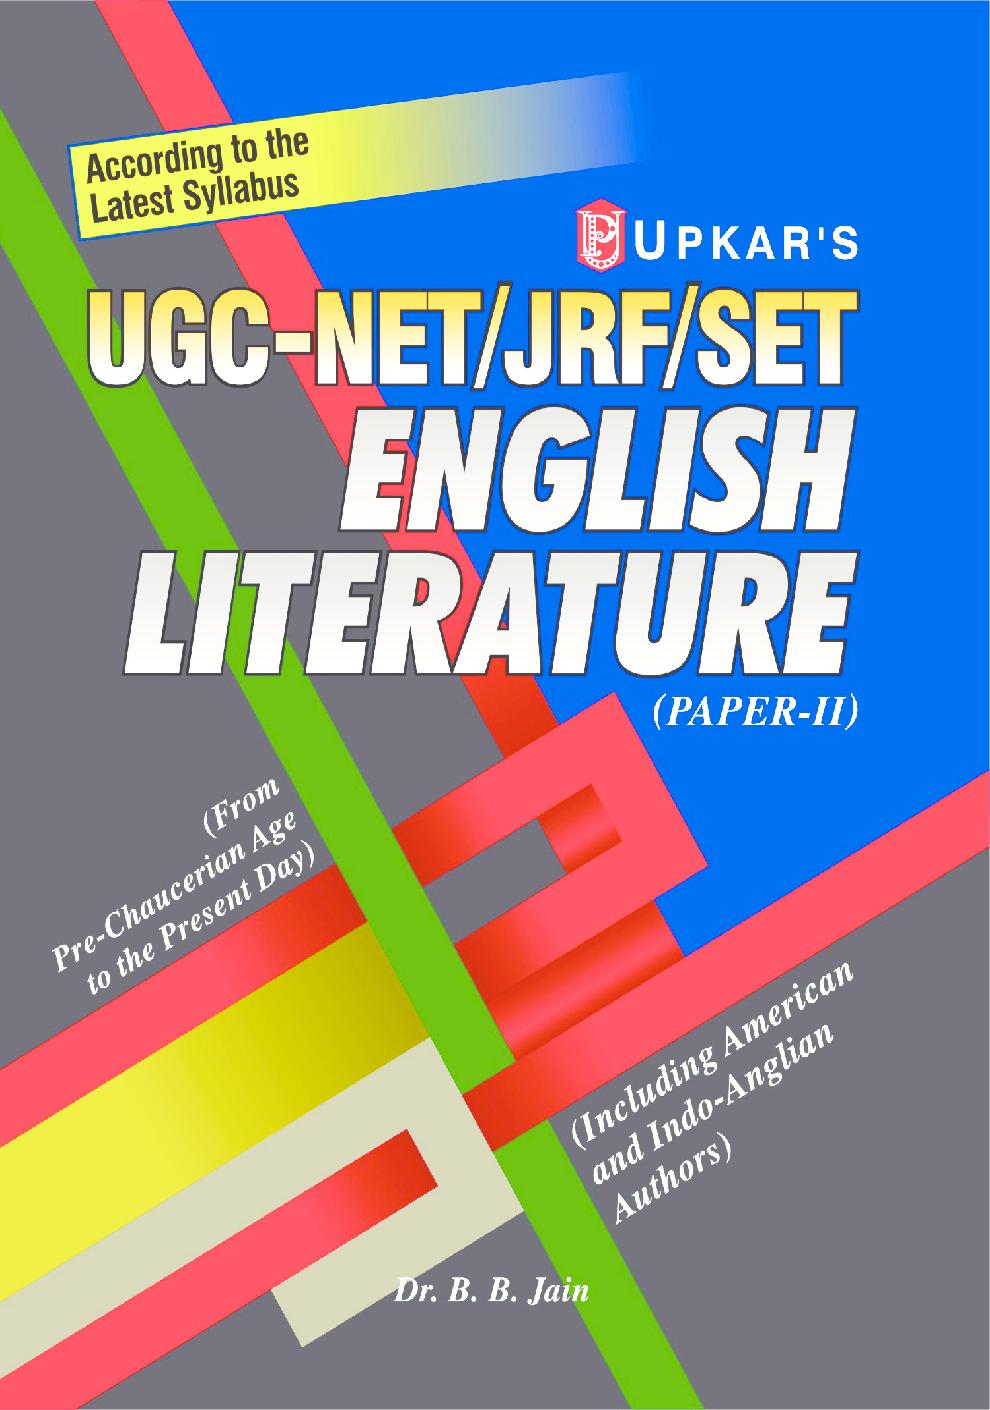 UGC Net JRF Set English Literature (Paper -II) - Page 1